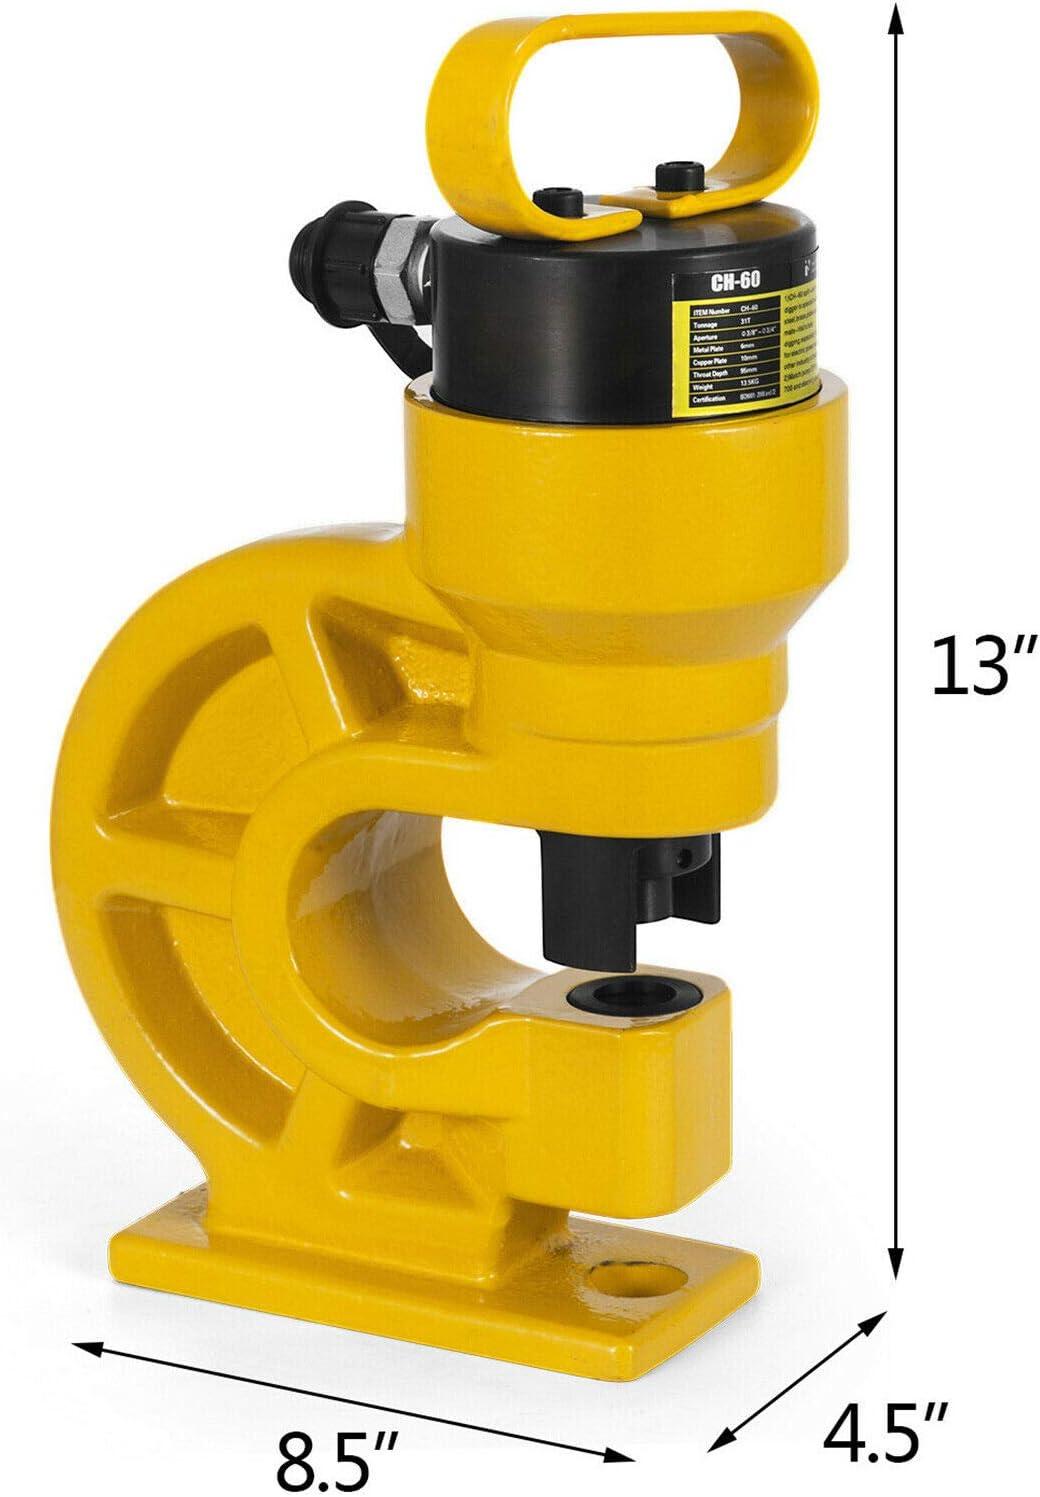 New 1pc 6.5*22mm Punching machine die Hydraulic punch die CH-60 Bar module